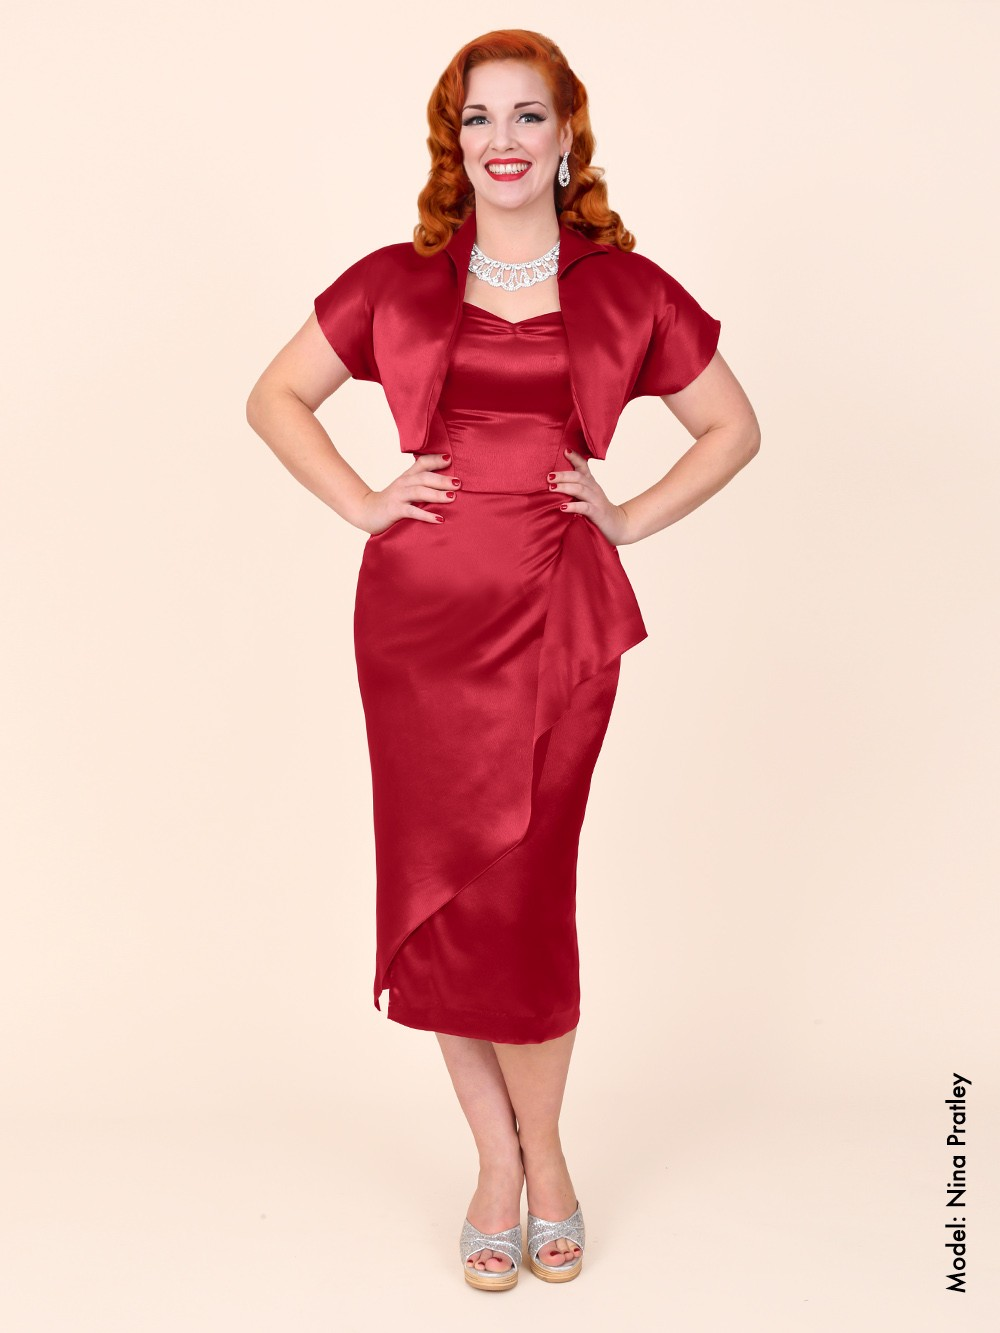 Tara Starlet 1940s 40s Style: 1940s Sarong Burgundy Satin From Vivien Of Holloway